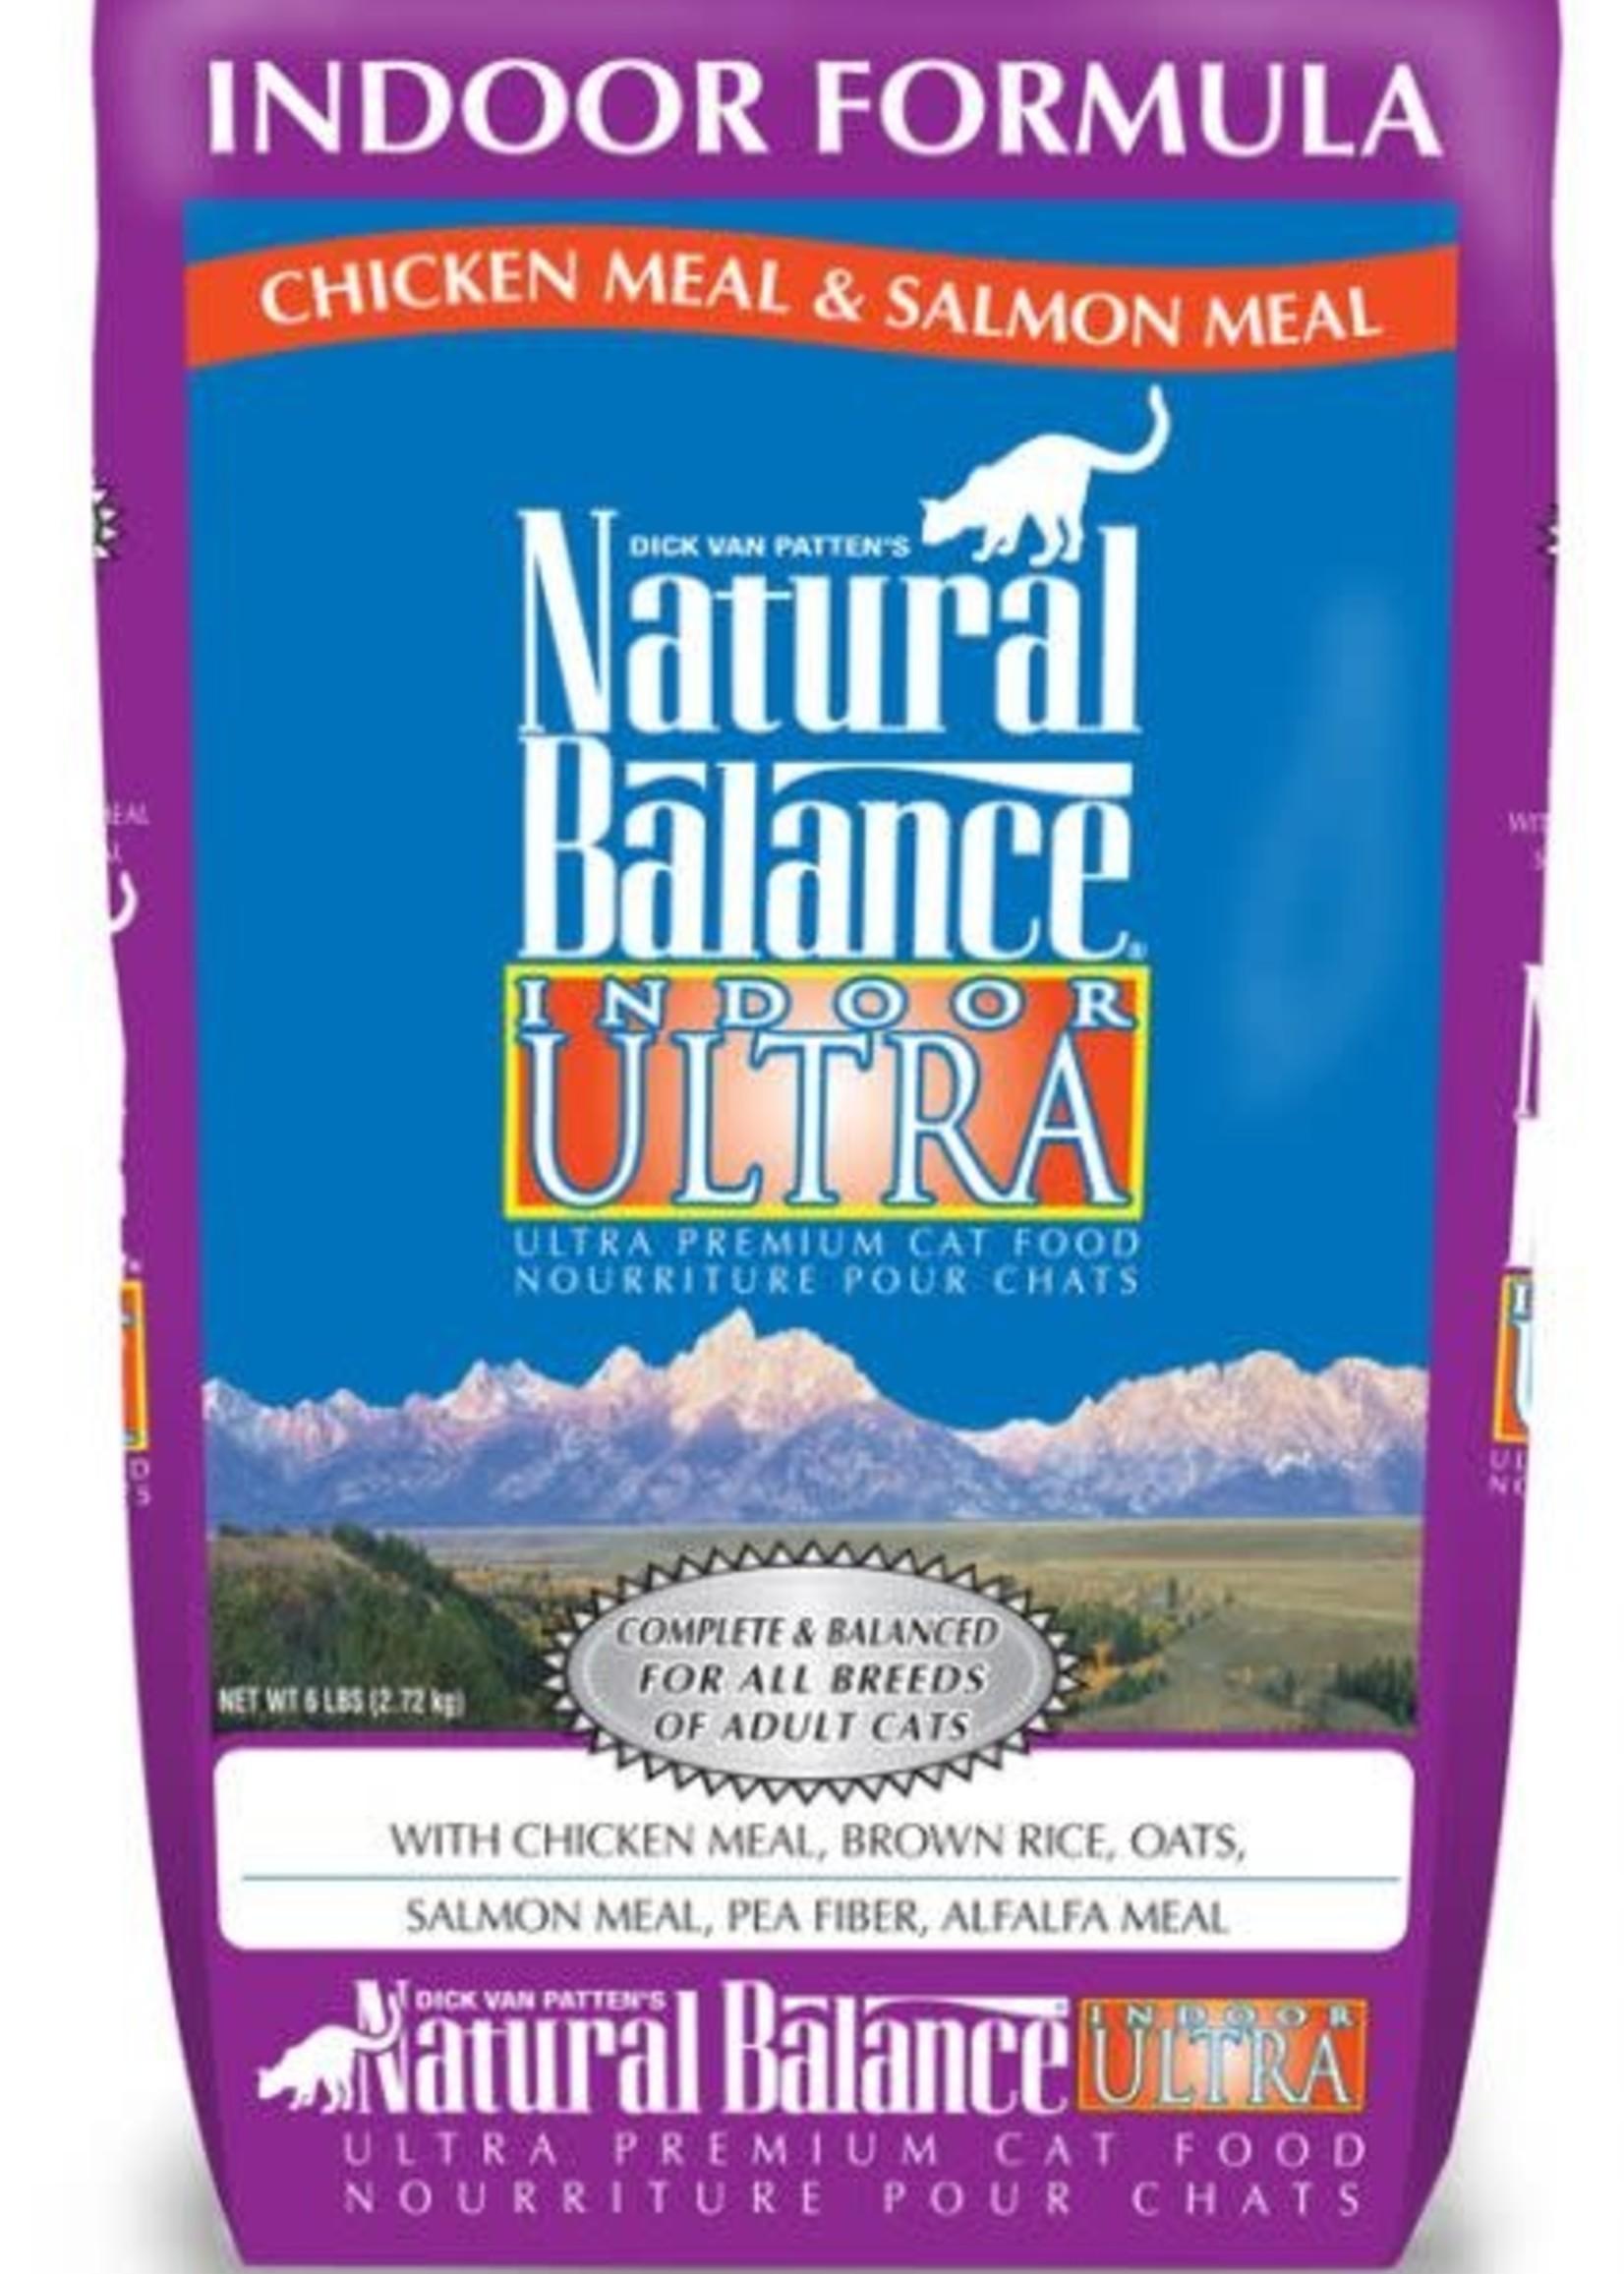 Natural Balance® NATURAL BALANCE INDOOR ULTRA CHICKEN &S ALMON MEAL FORMULA 15lbs